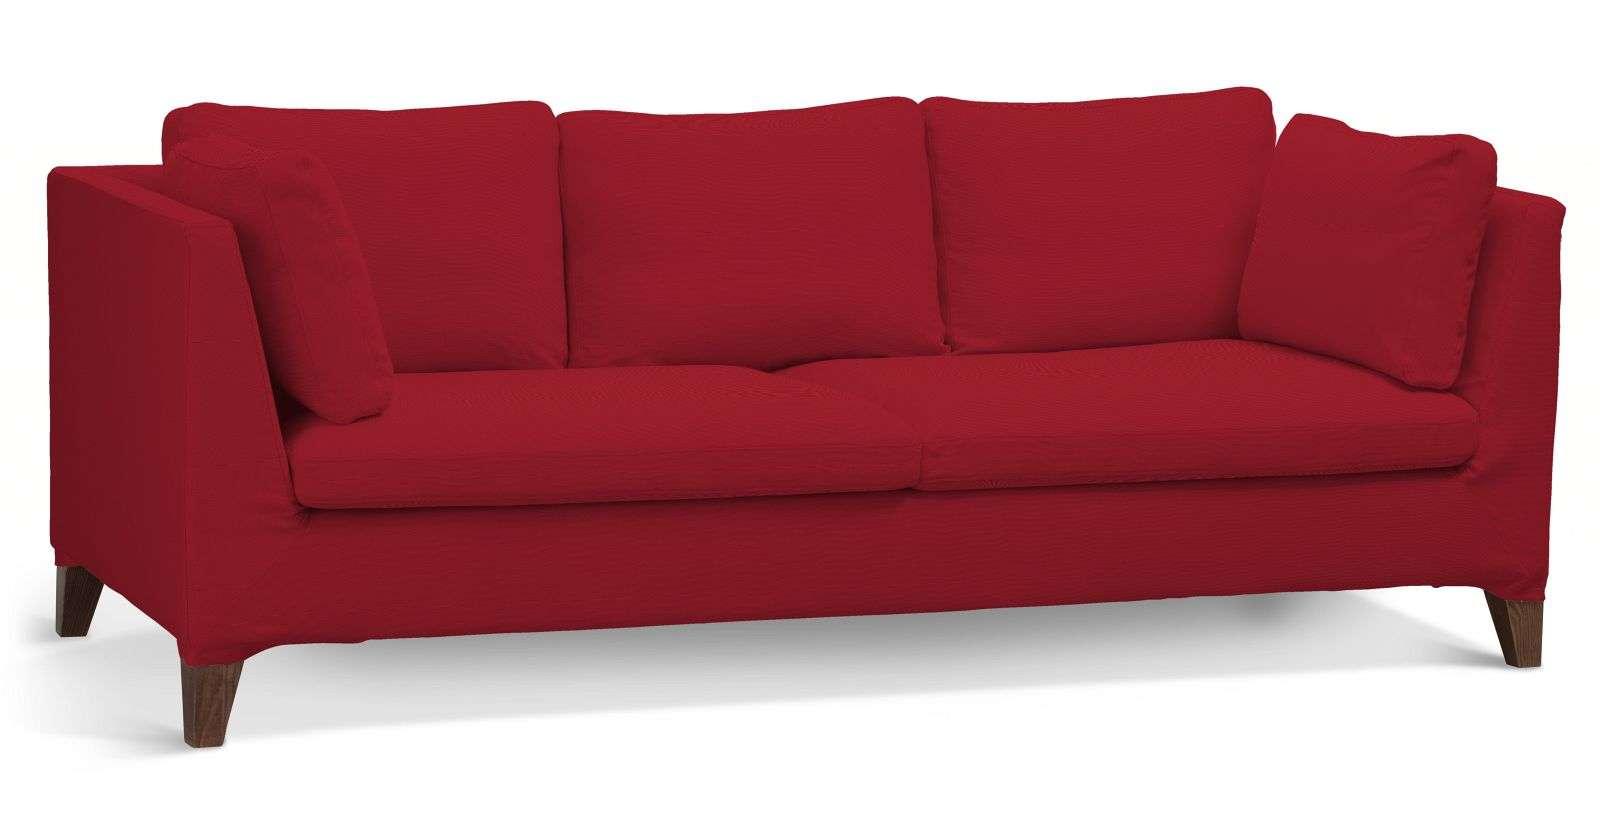 Stockholm 3-Sitzer Sofabezug Stockholm 3-Sitzer von der Kollektion Etna, Stoff: 705-60